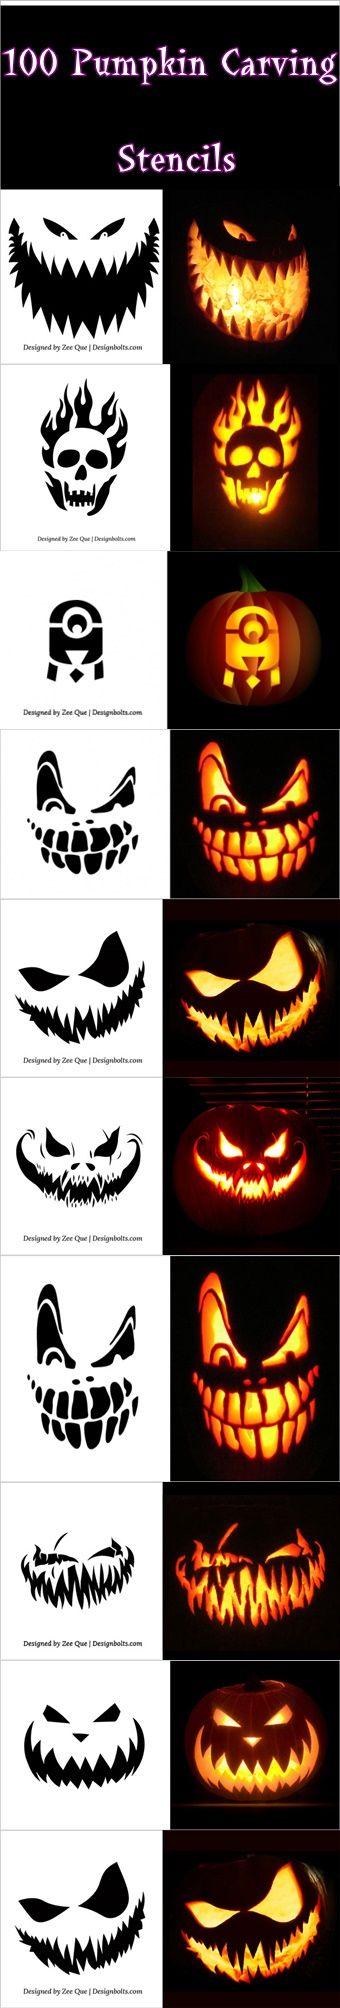 Best halloween pumpkin carvings ideas only on